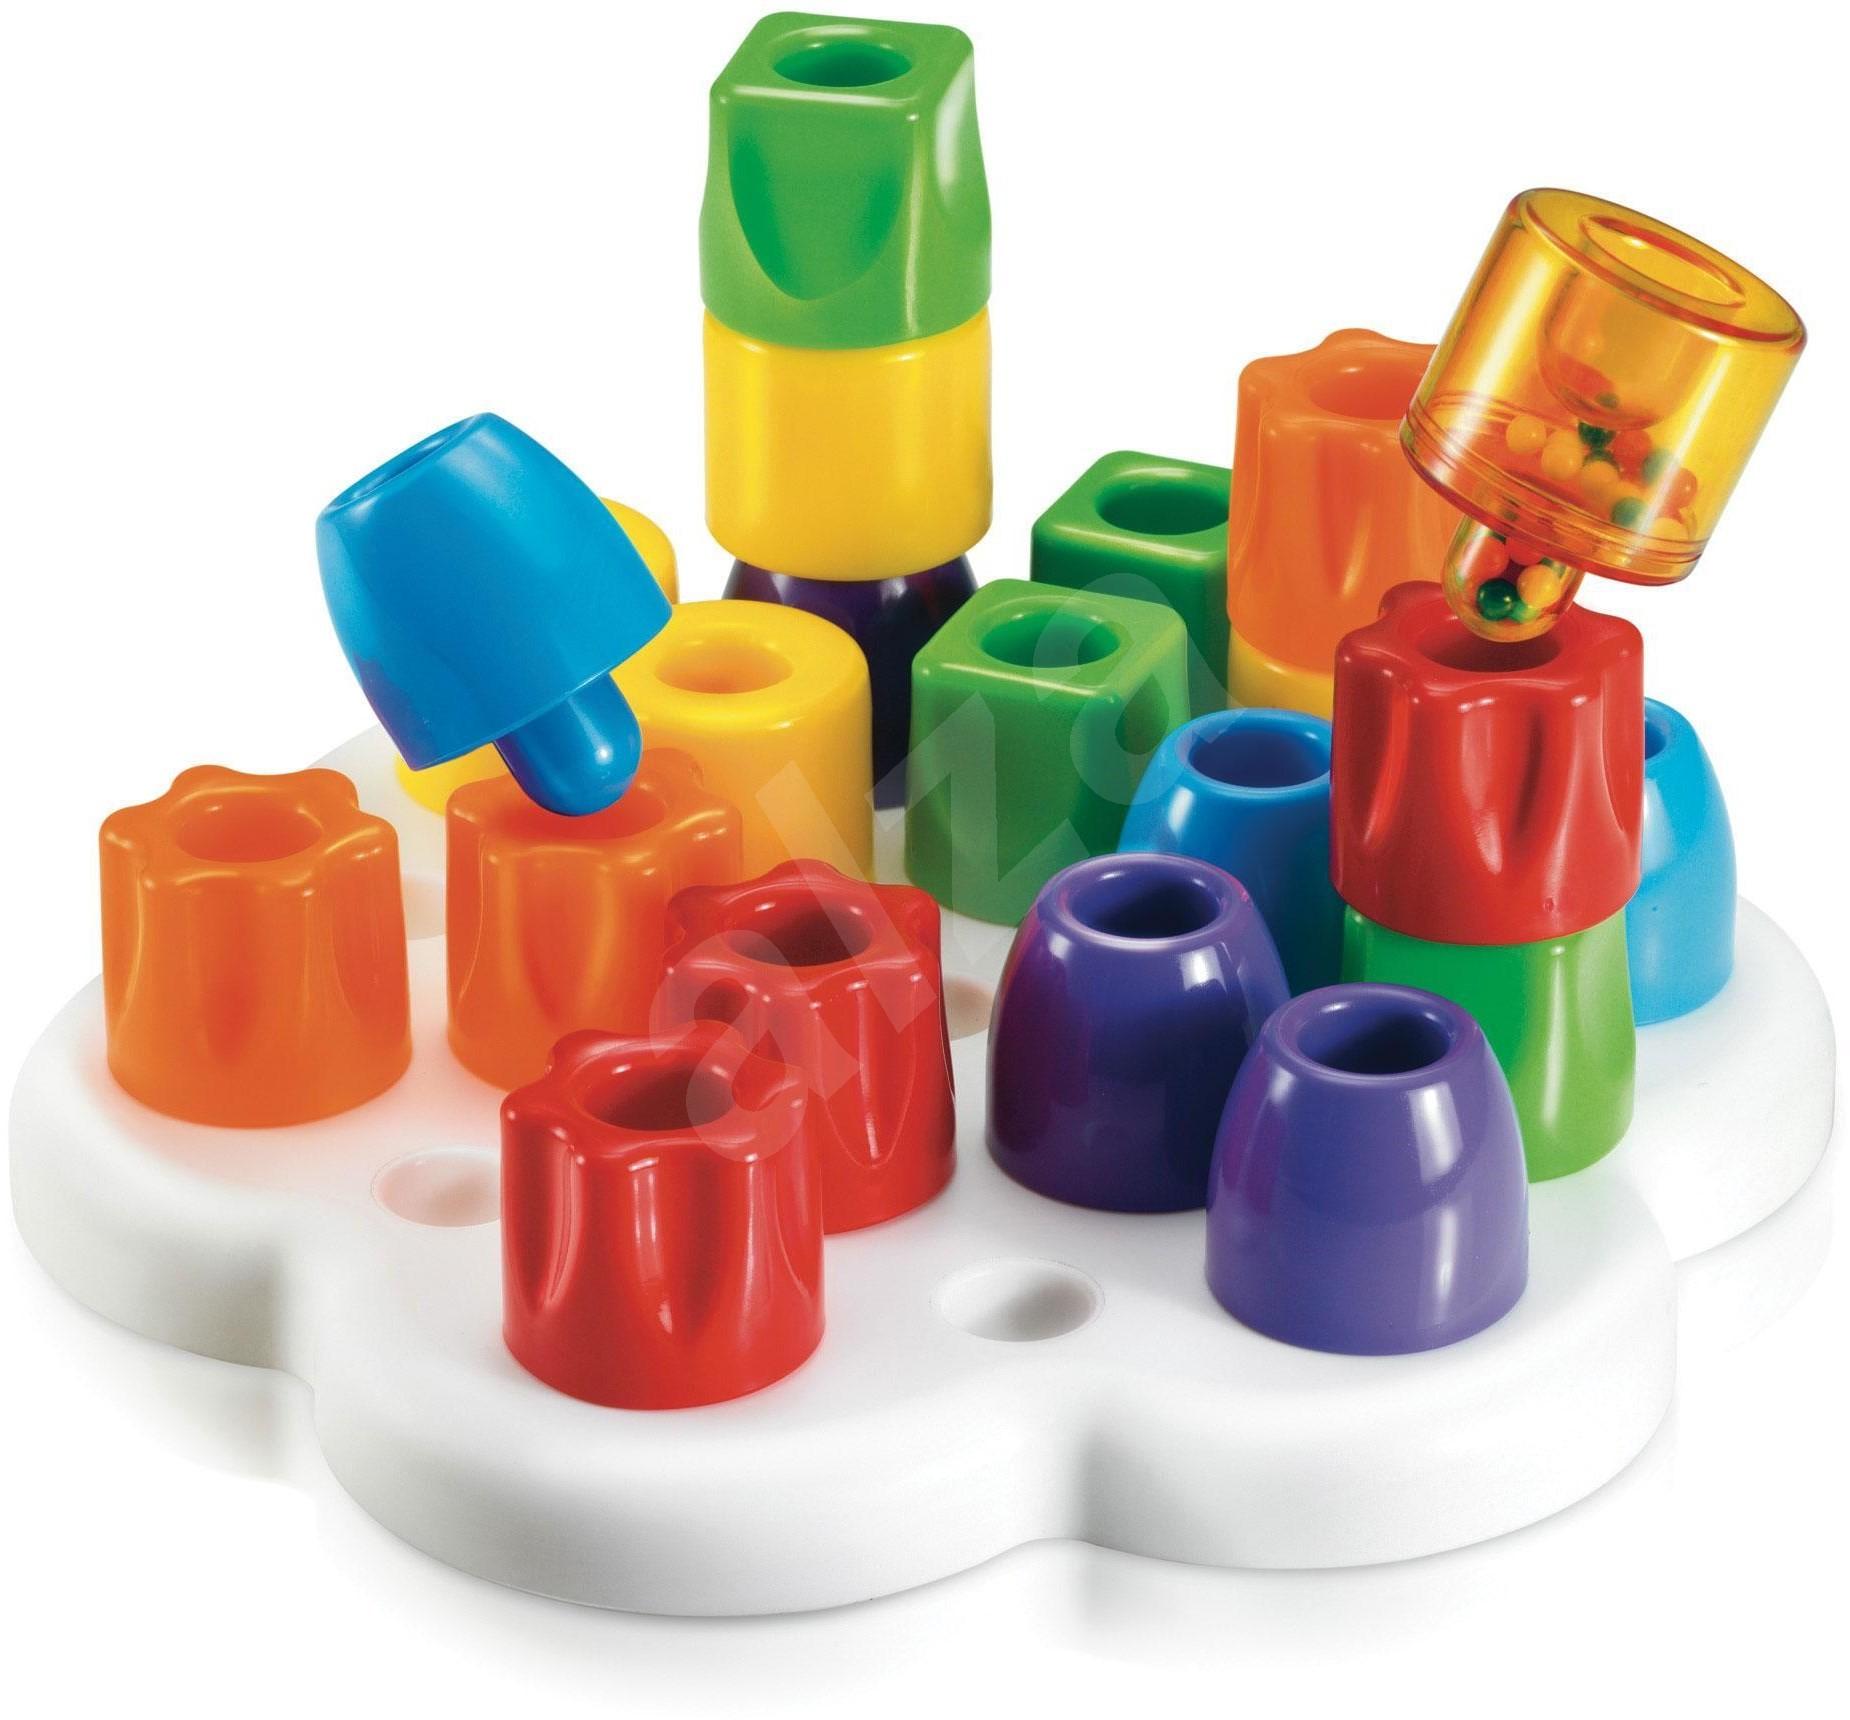 Daisy Maxi - Didactic Toy | Alzashop.com